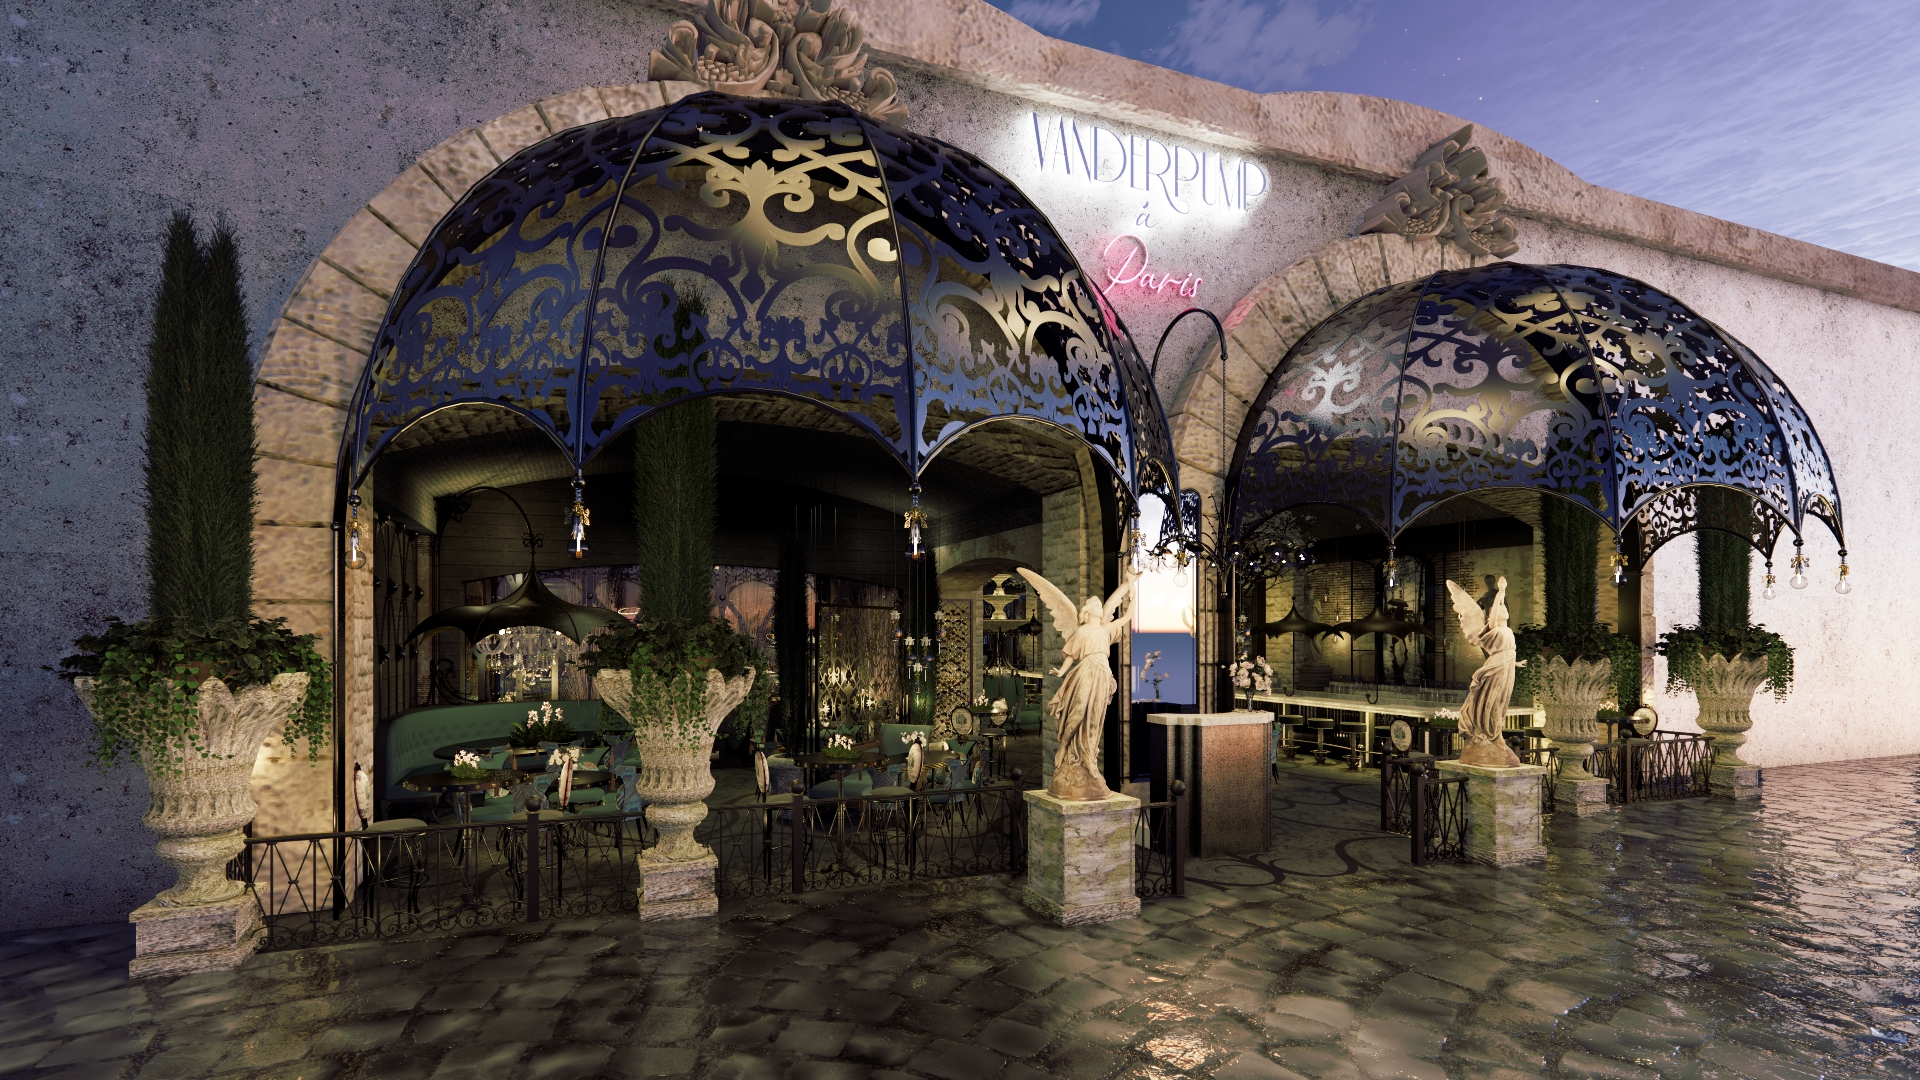 A rendering of a future bar from Lisa Vanderpump